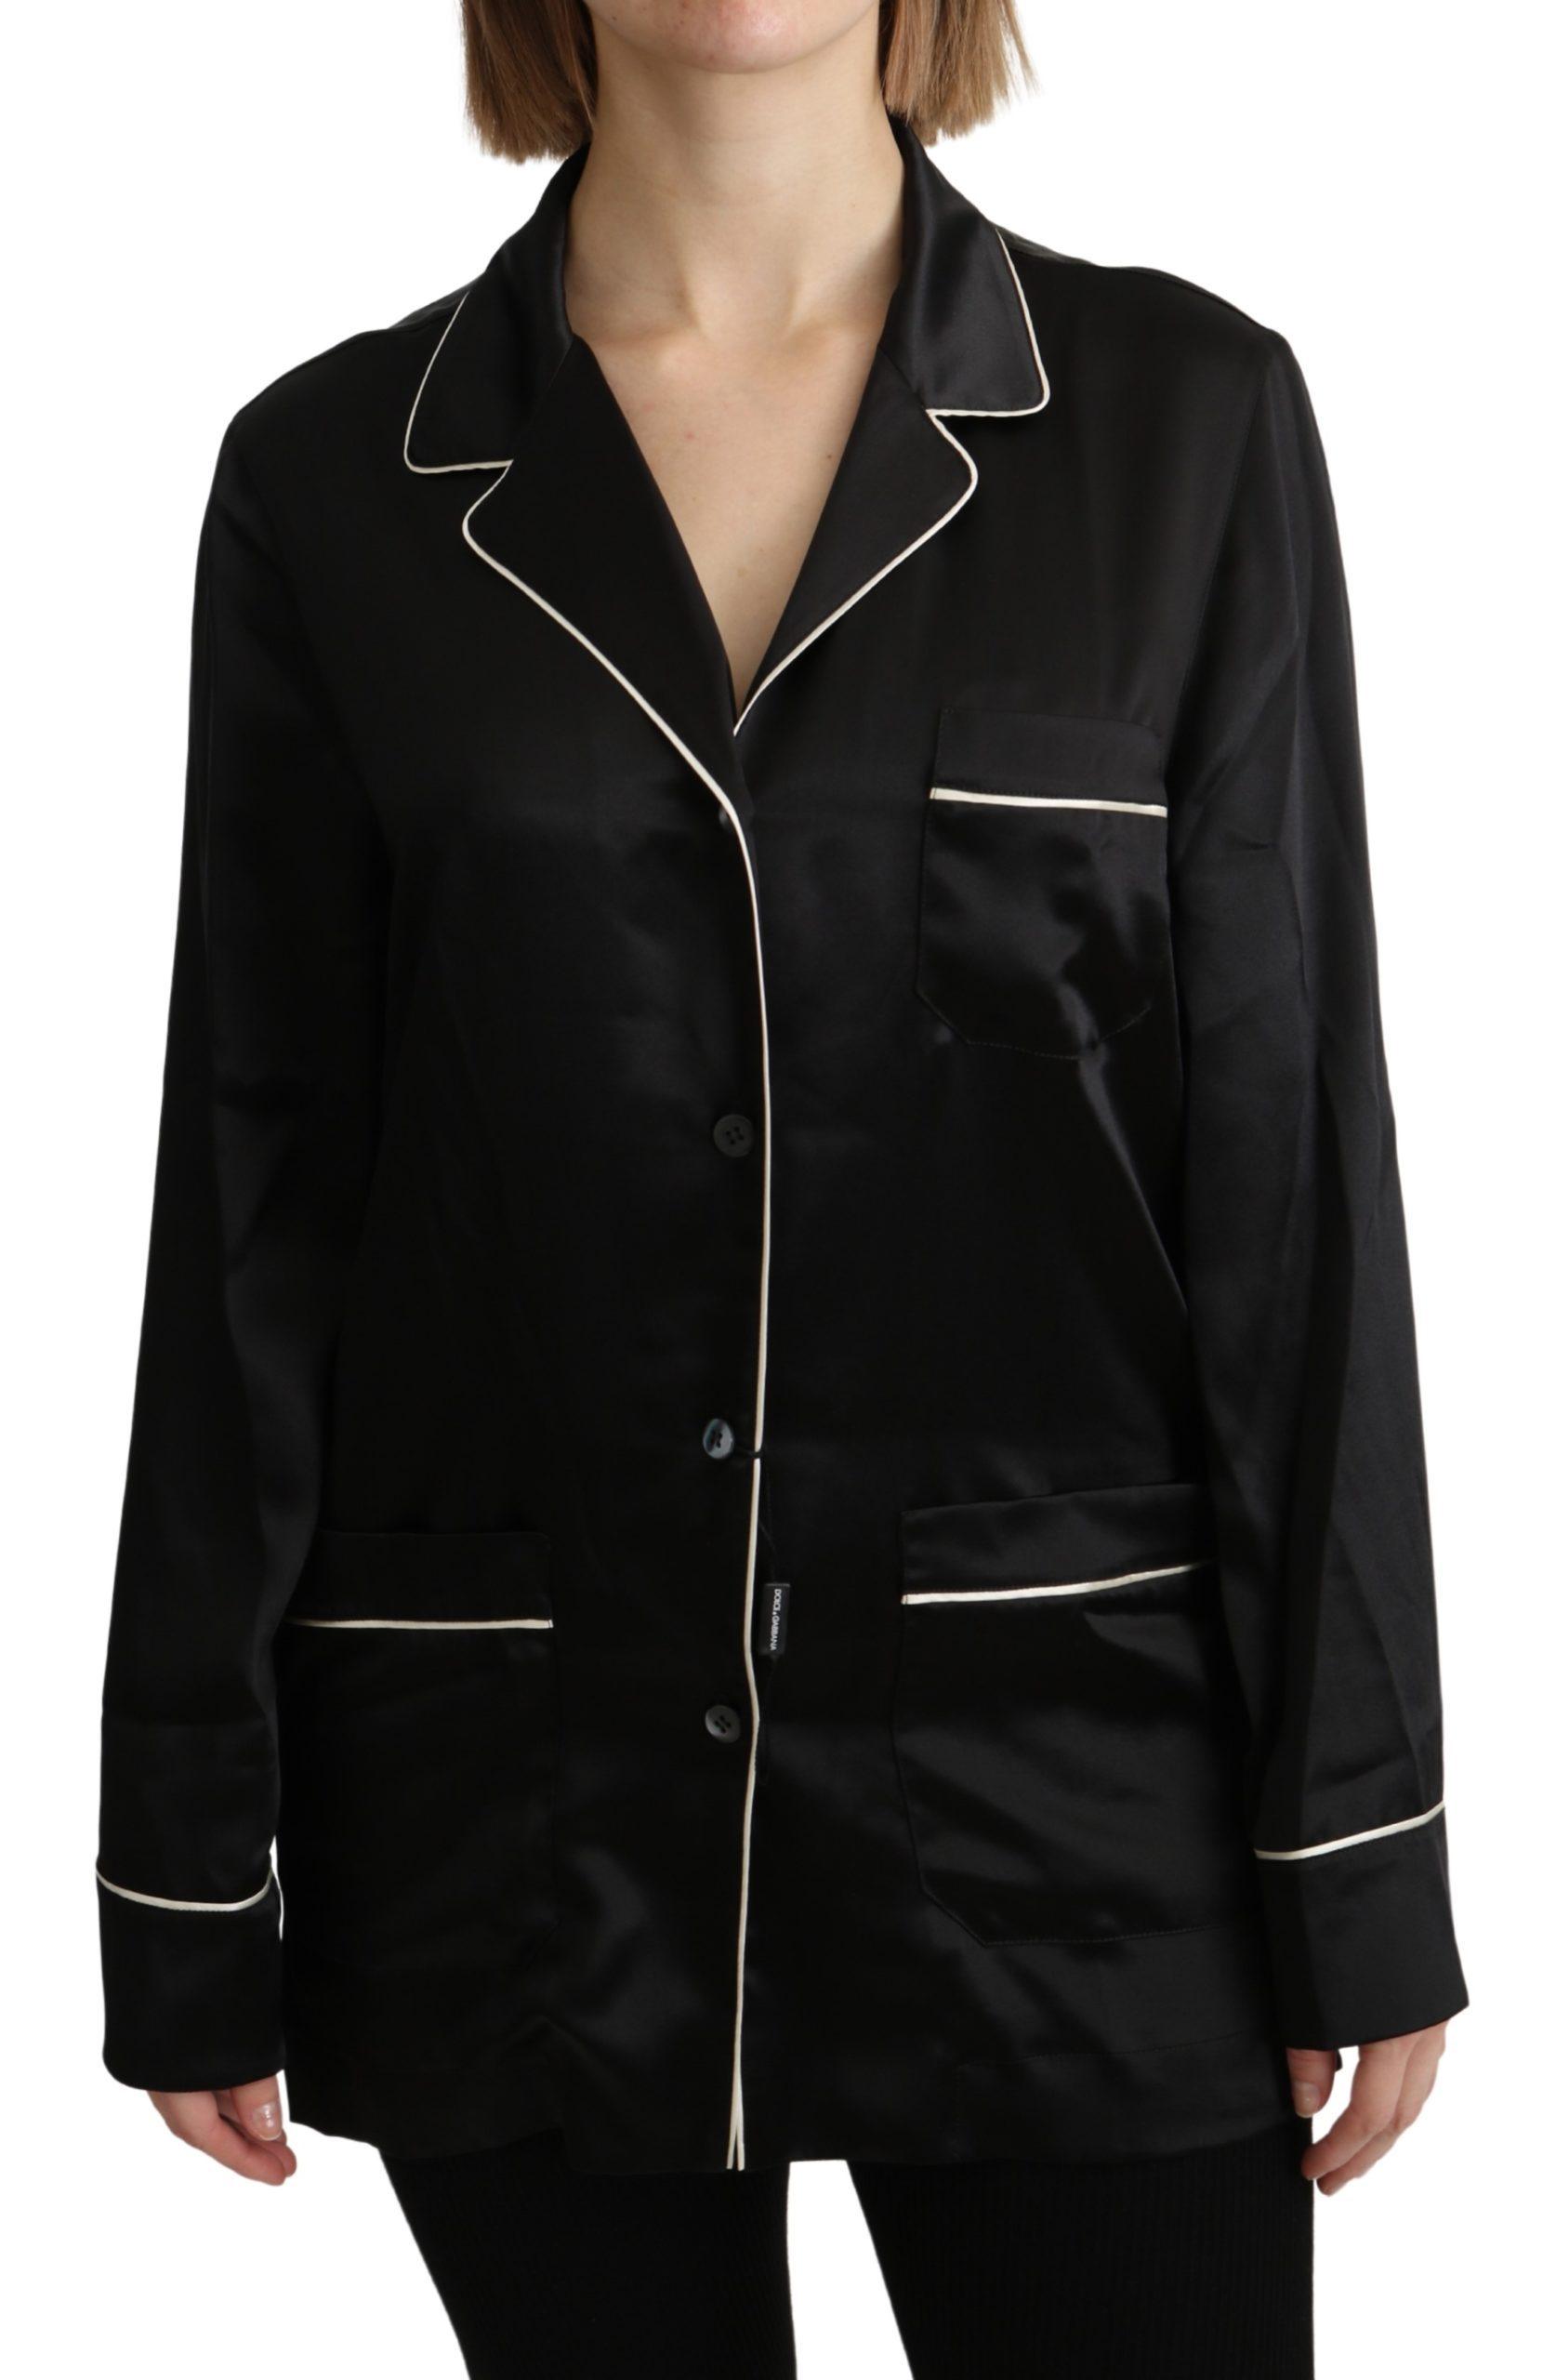 Dolce & Gabbana Women's Silk Stretch Shirt Black TSH4819 - IT44|L